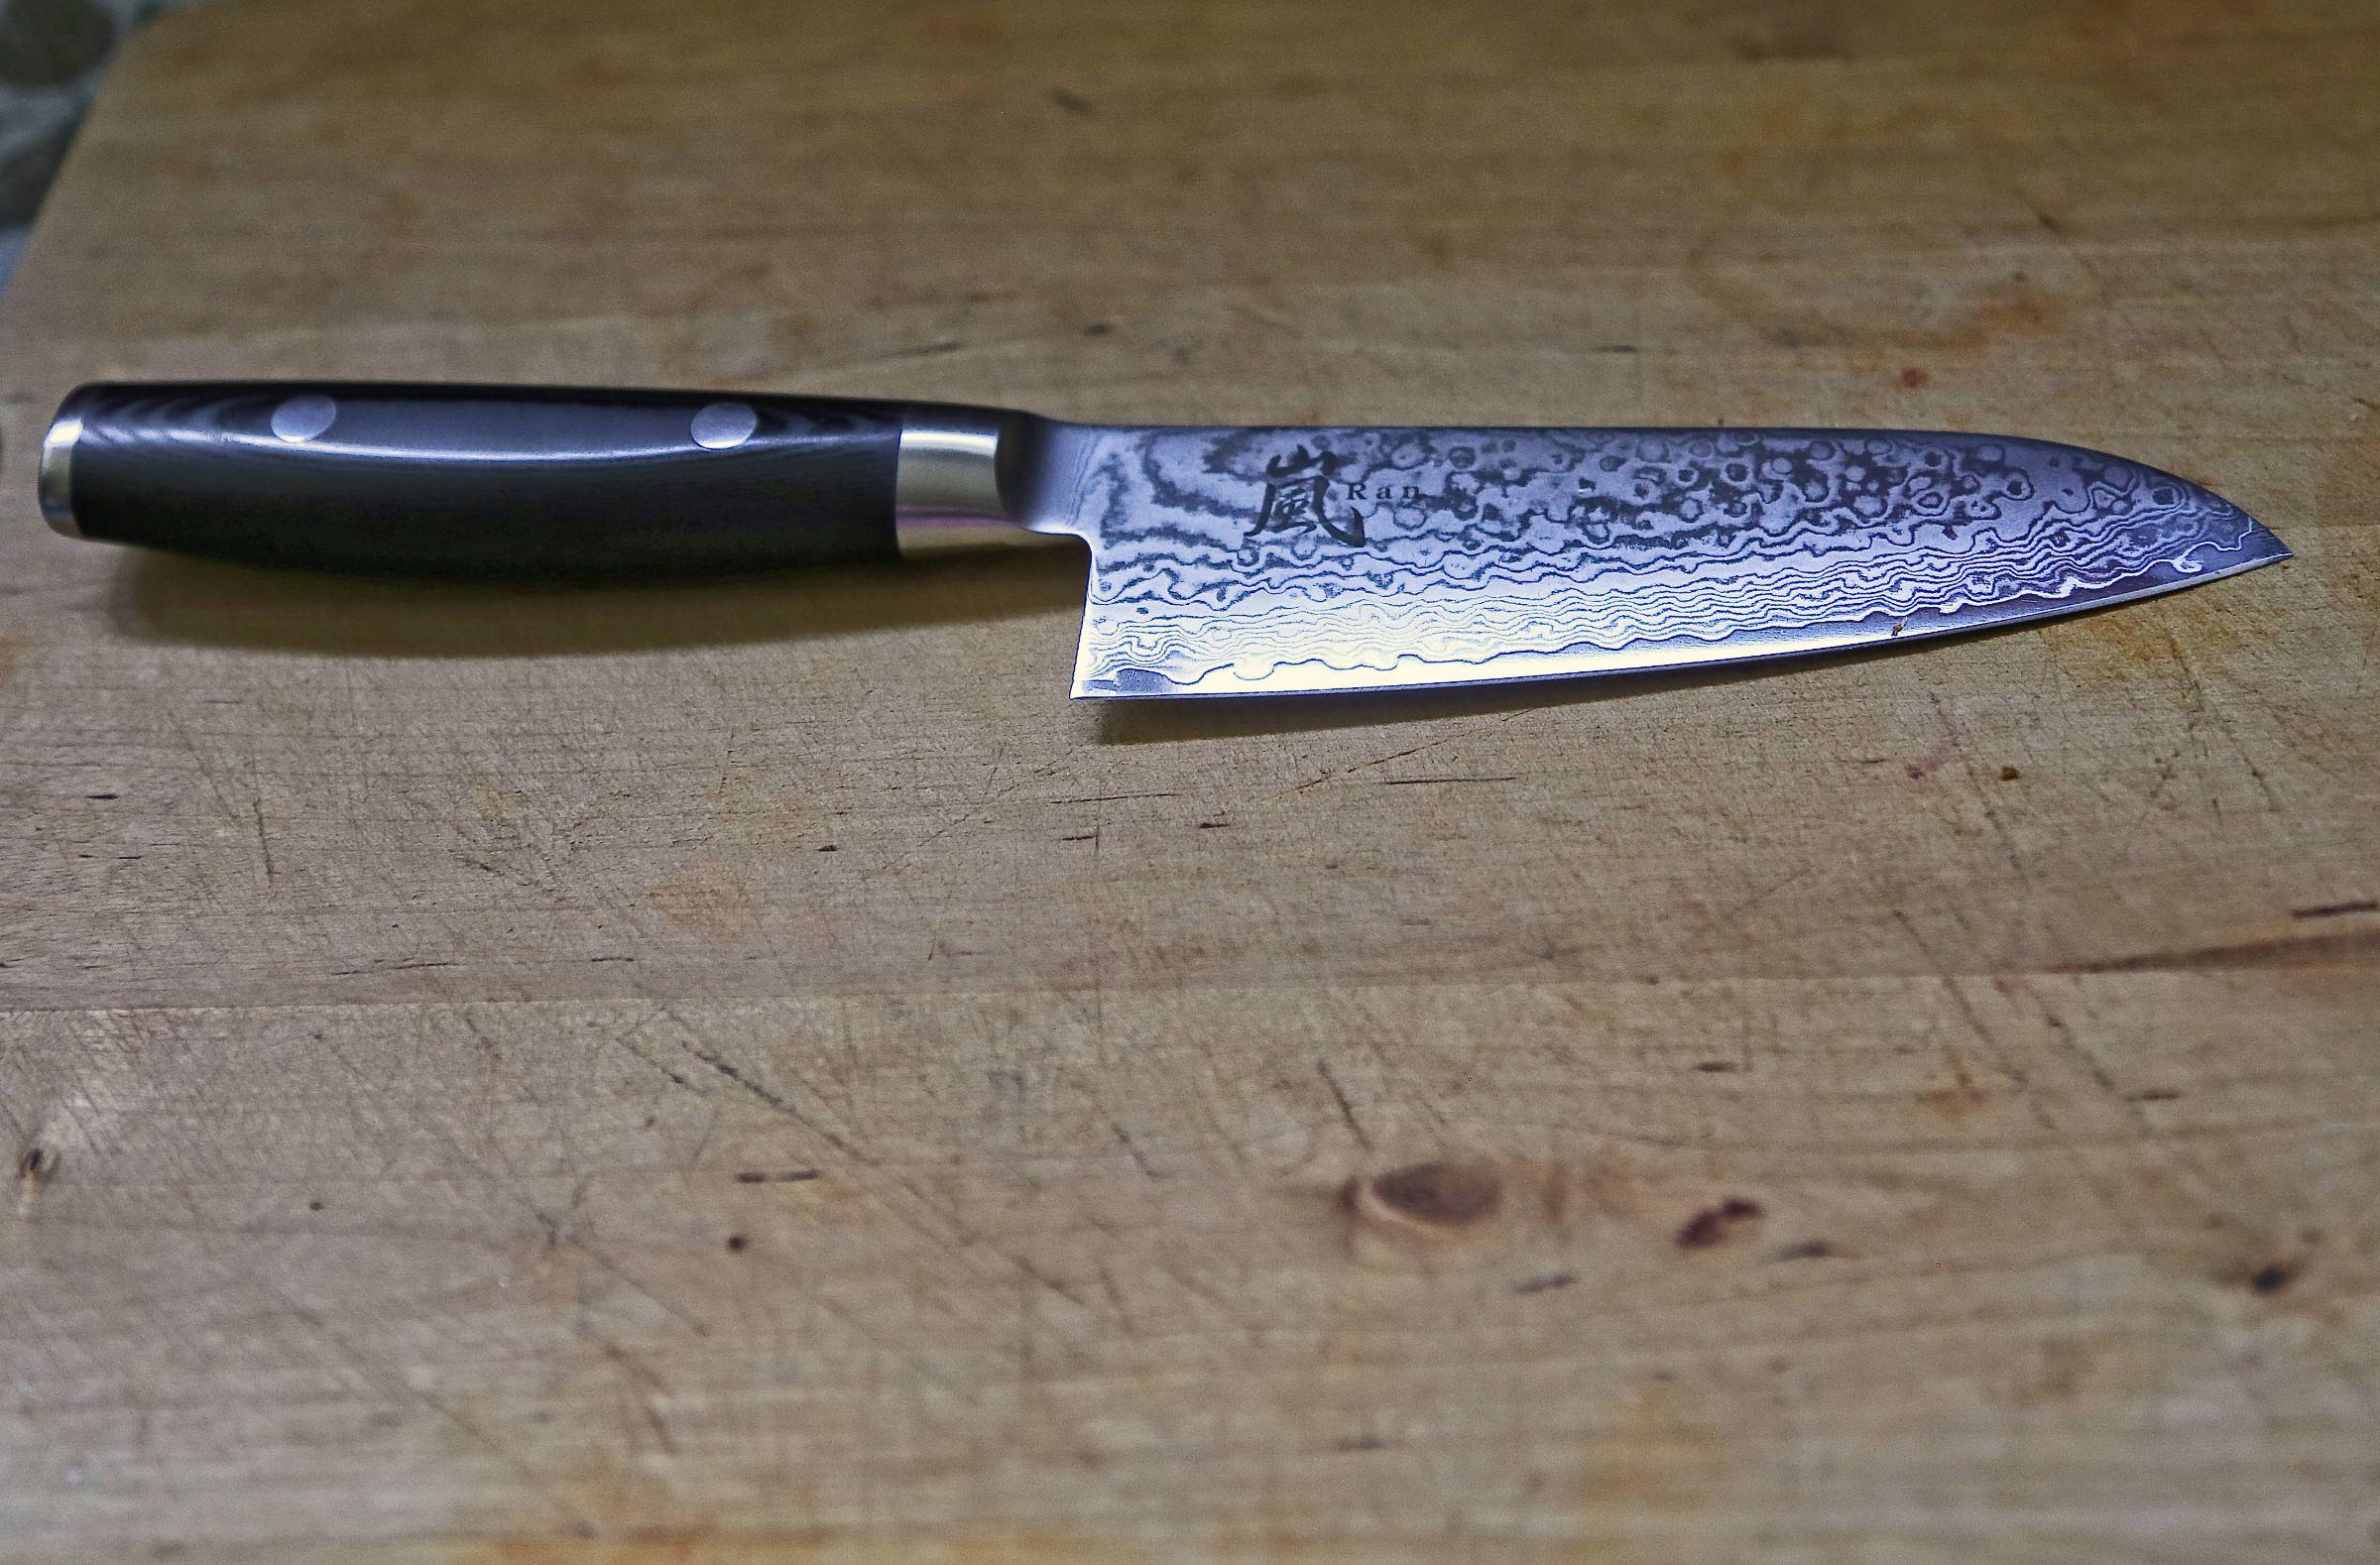 Yaxell Ran 5-inch Santoku Knife, VG10 stainless steel, 69 layered Damascus